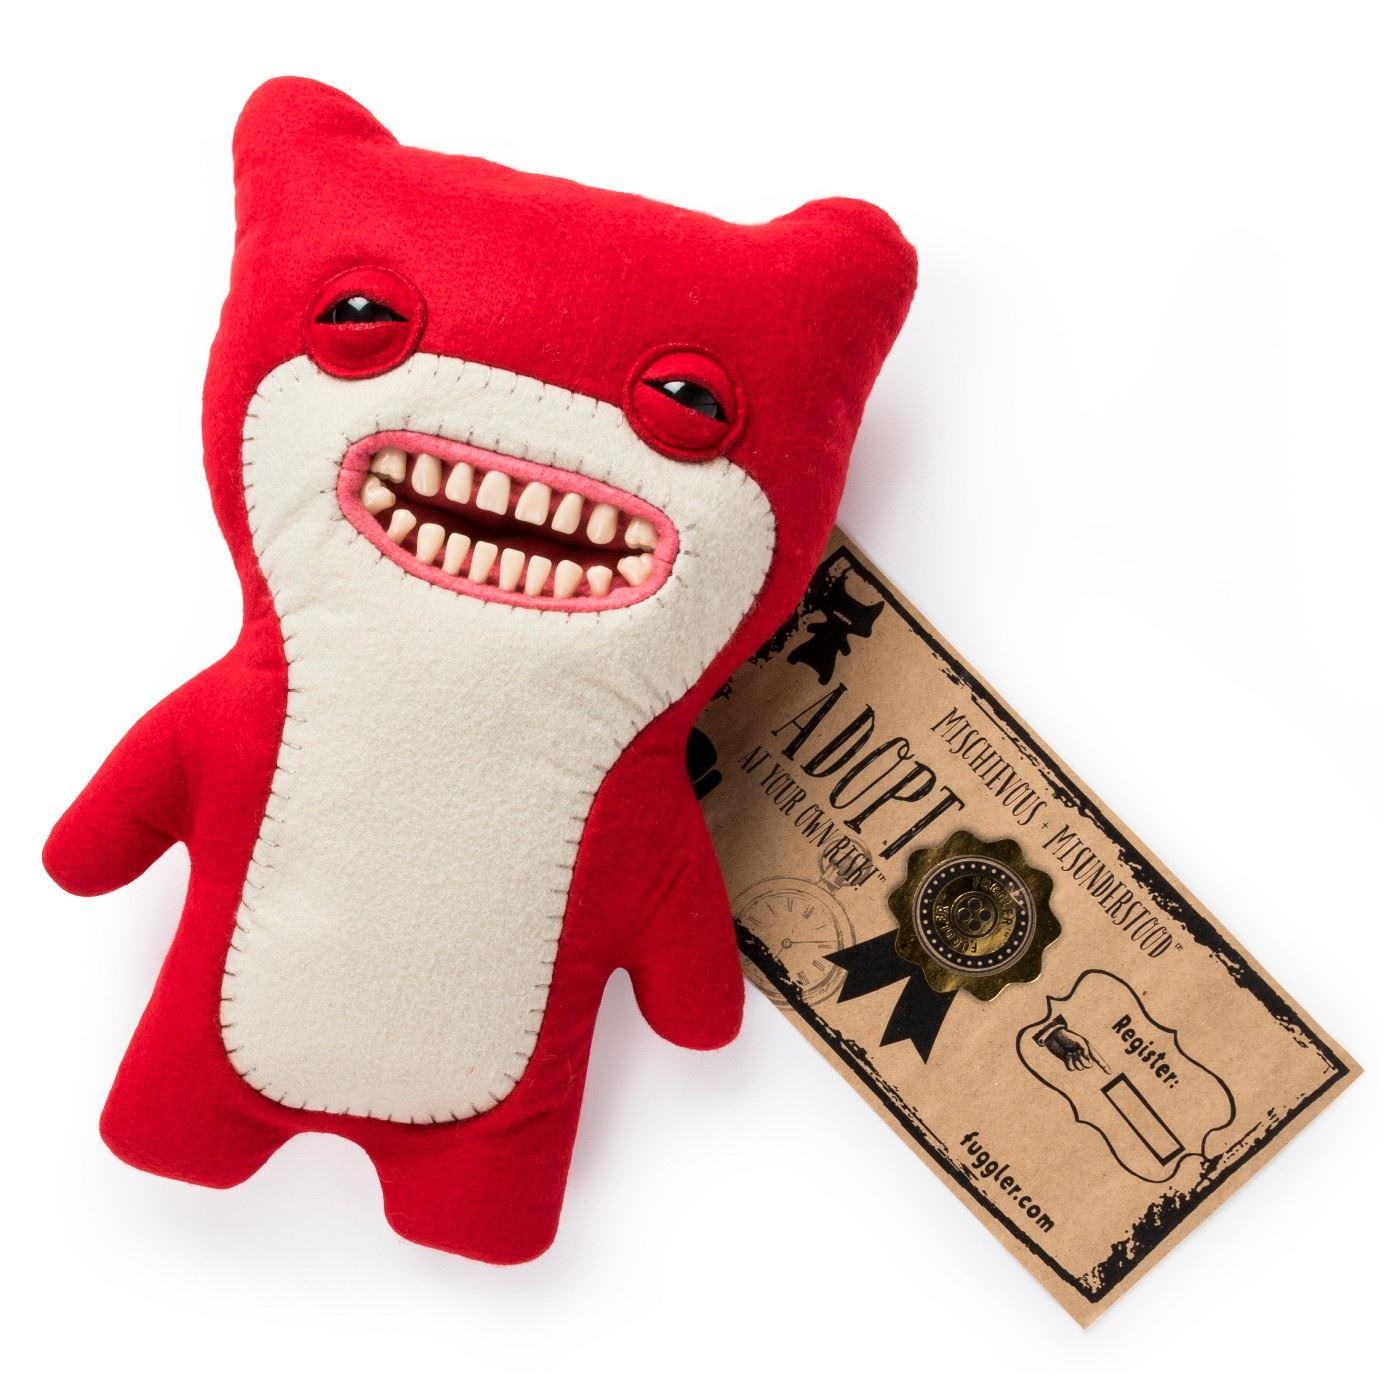 Fuggler-Funny-Uggly-Monsters-Blue-Red-Purple-Light-Red-Stuffed-Animal 縮圖 8